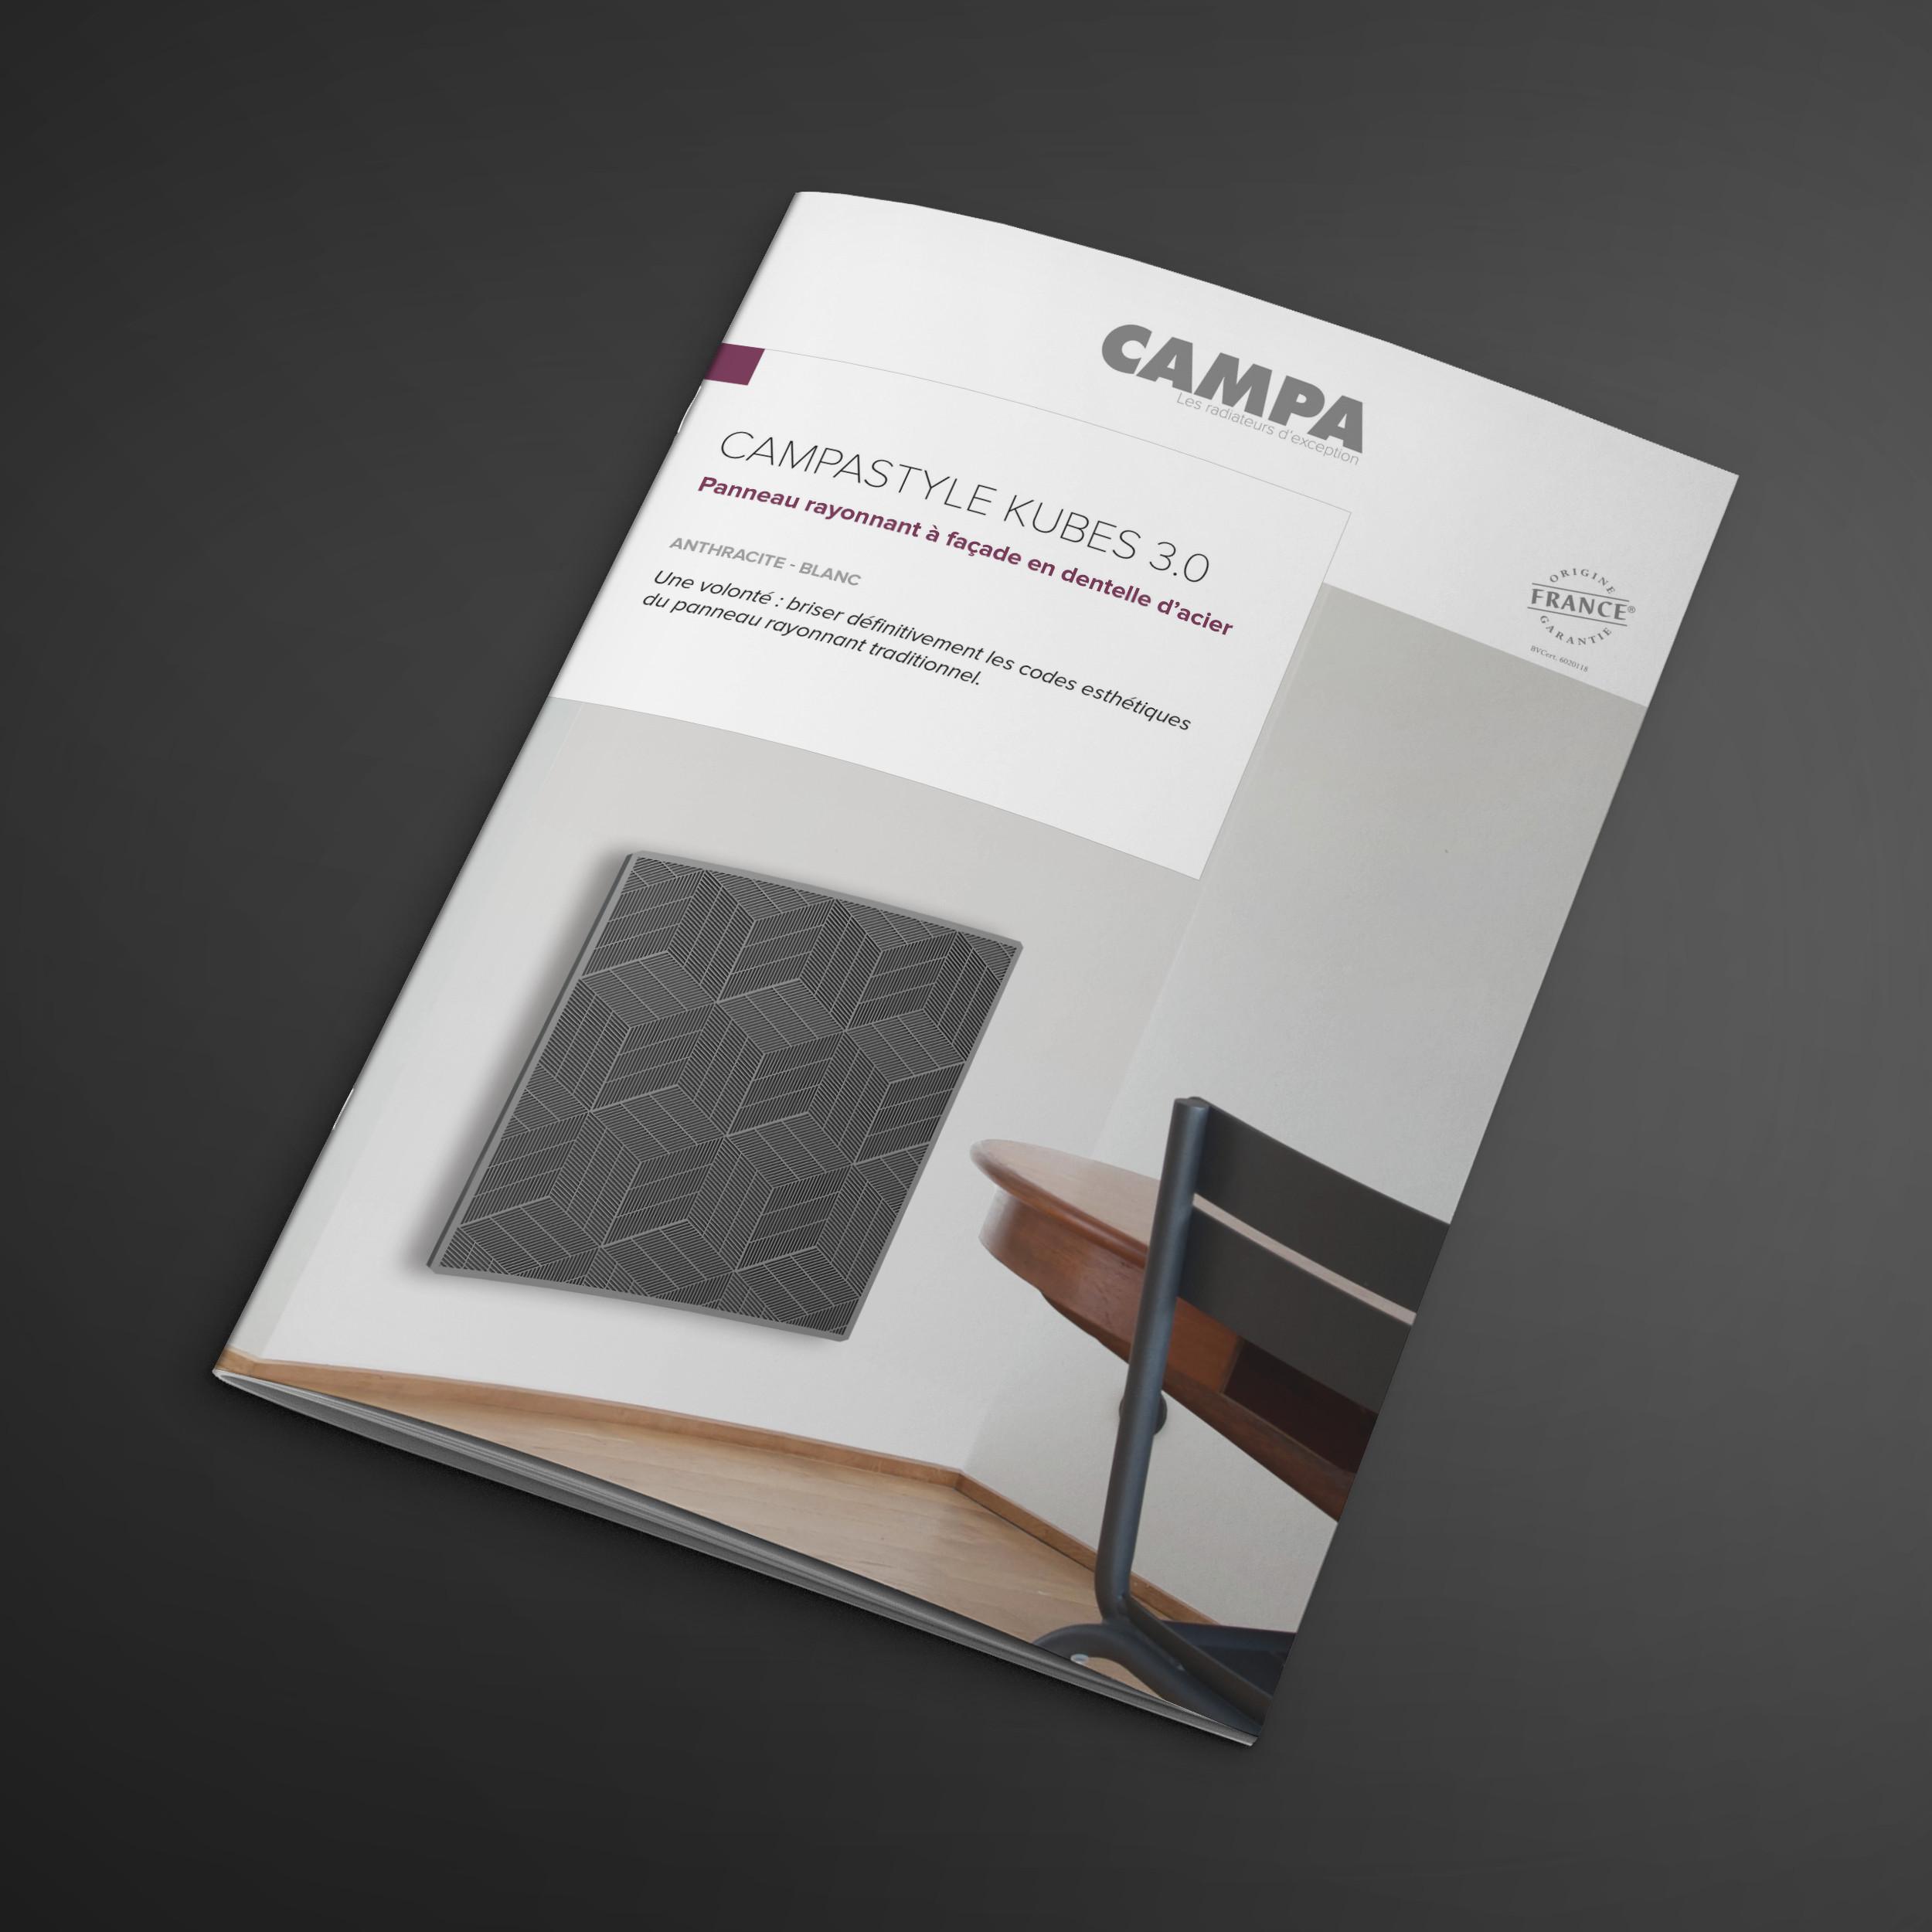 CAMPASTYLE KUBES 3.0